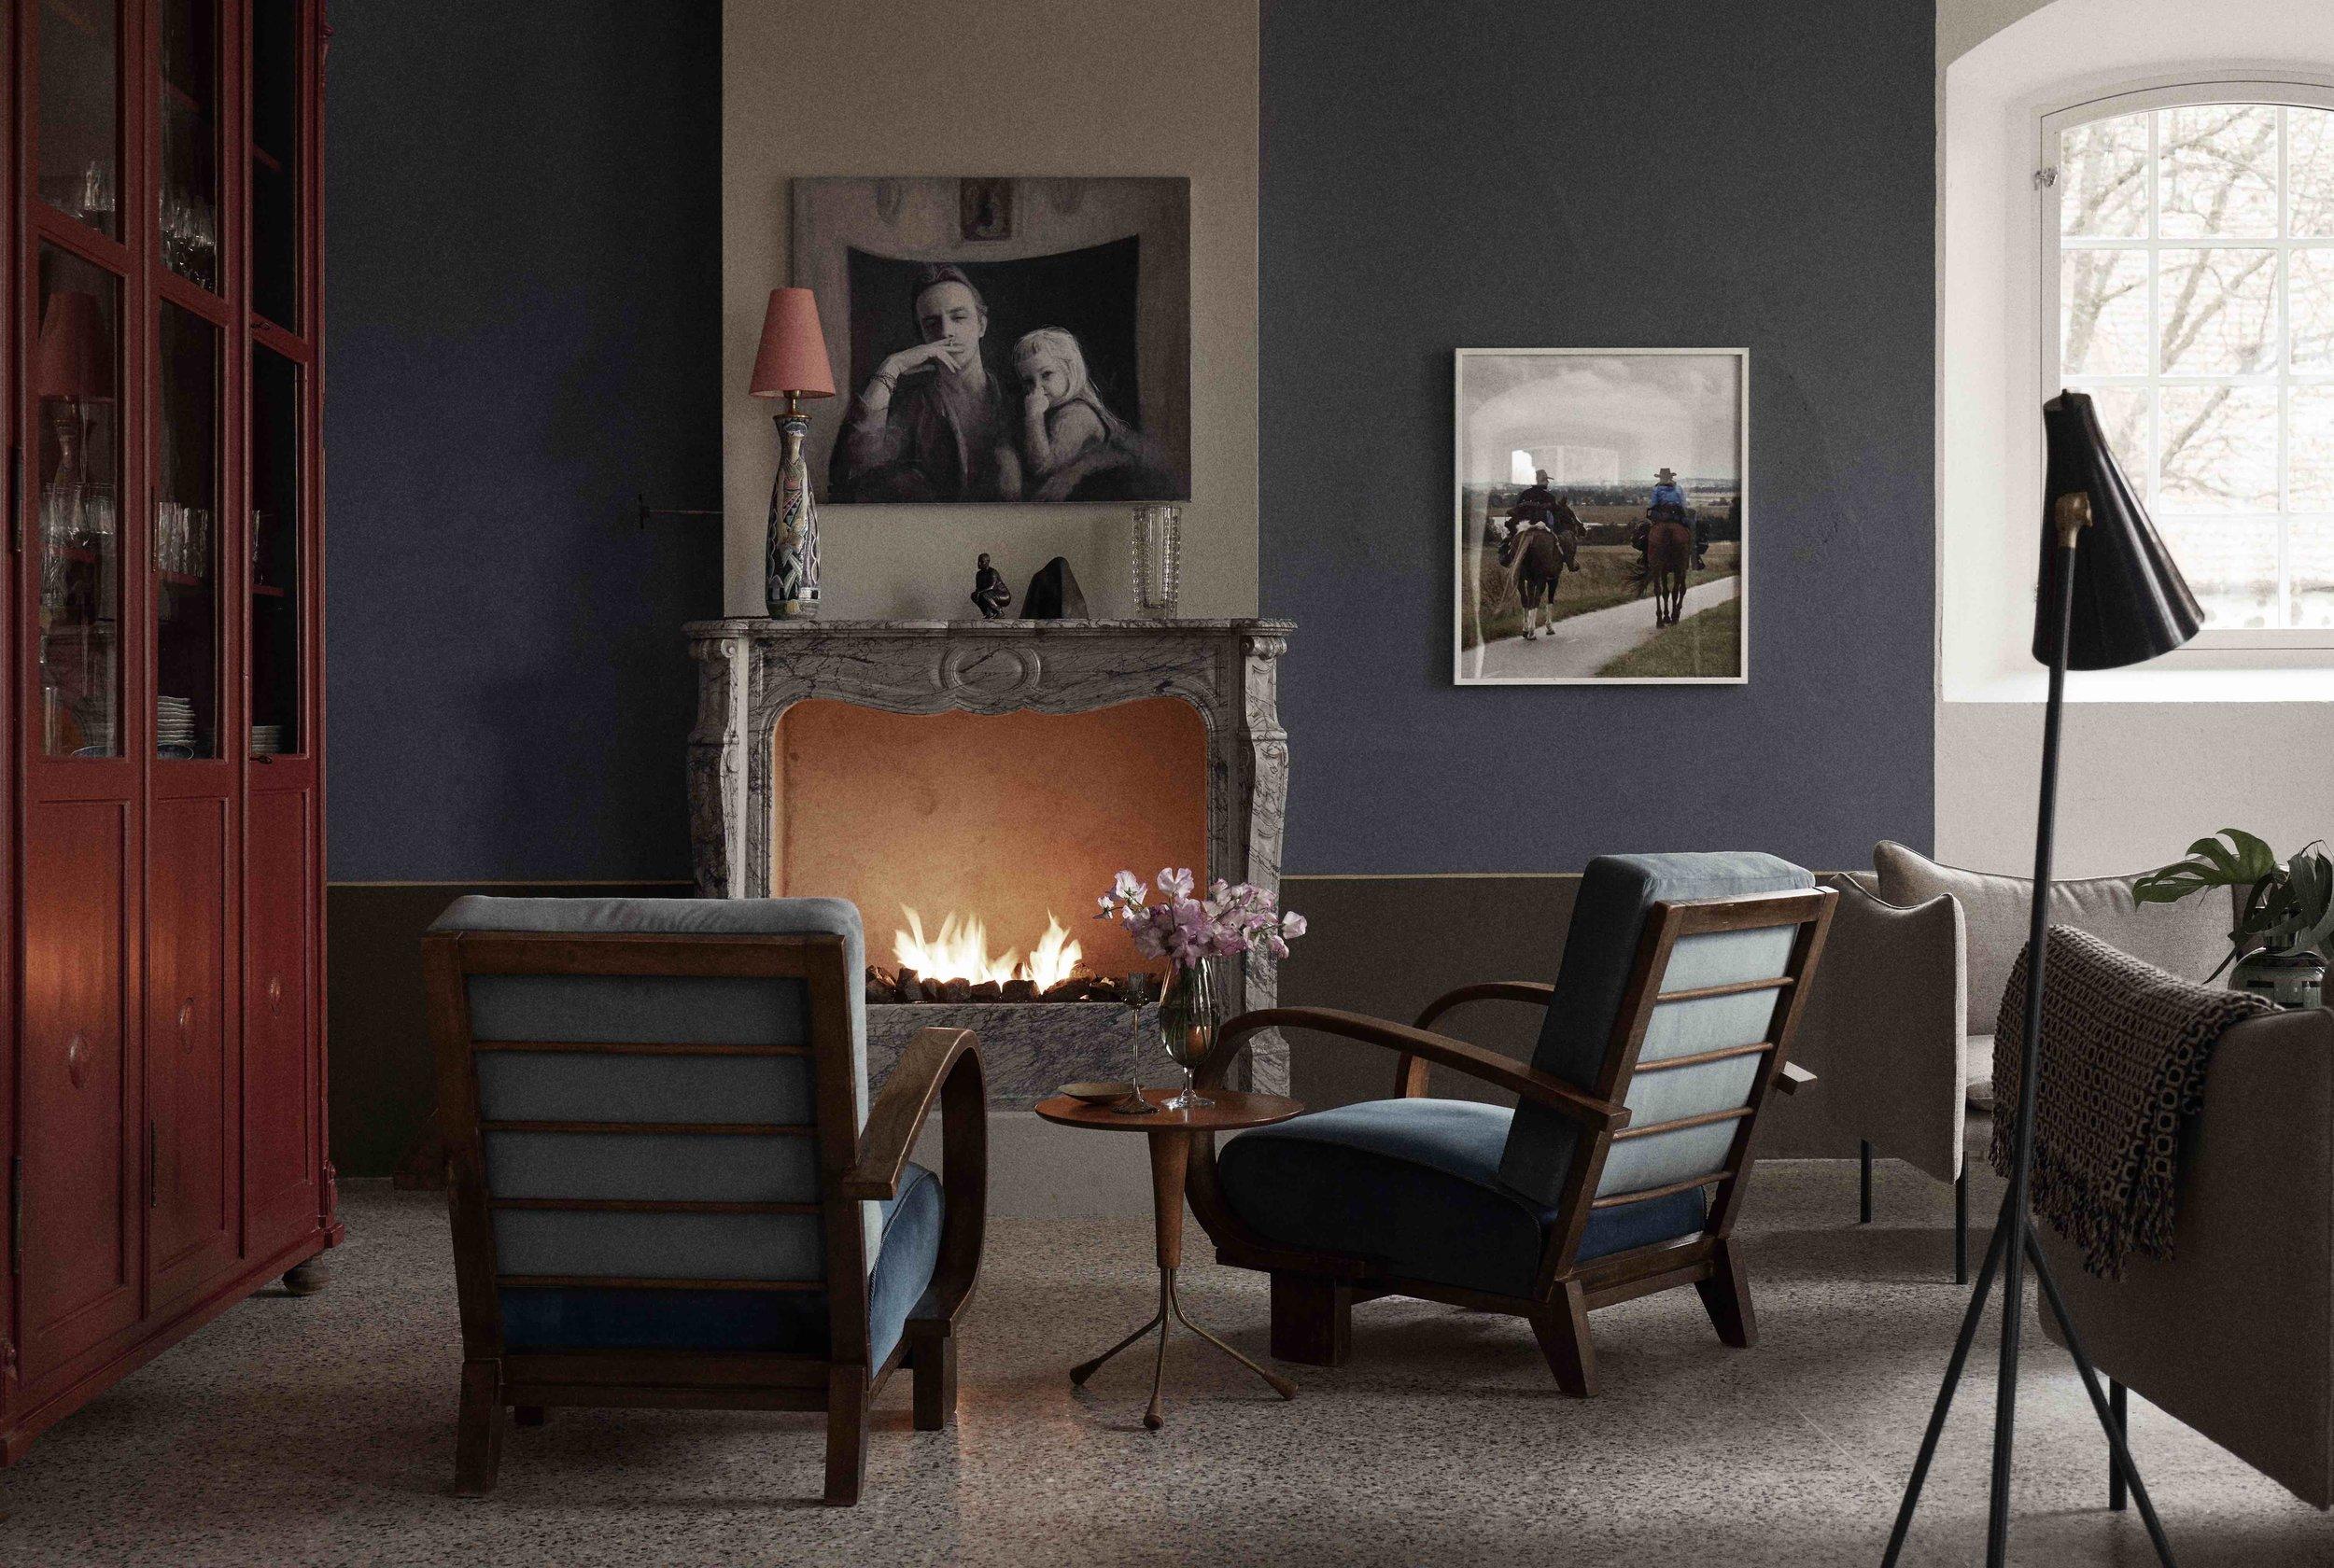 Hotel_lounge_mardinger742_WEB.jpg